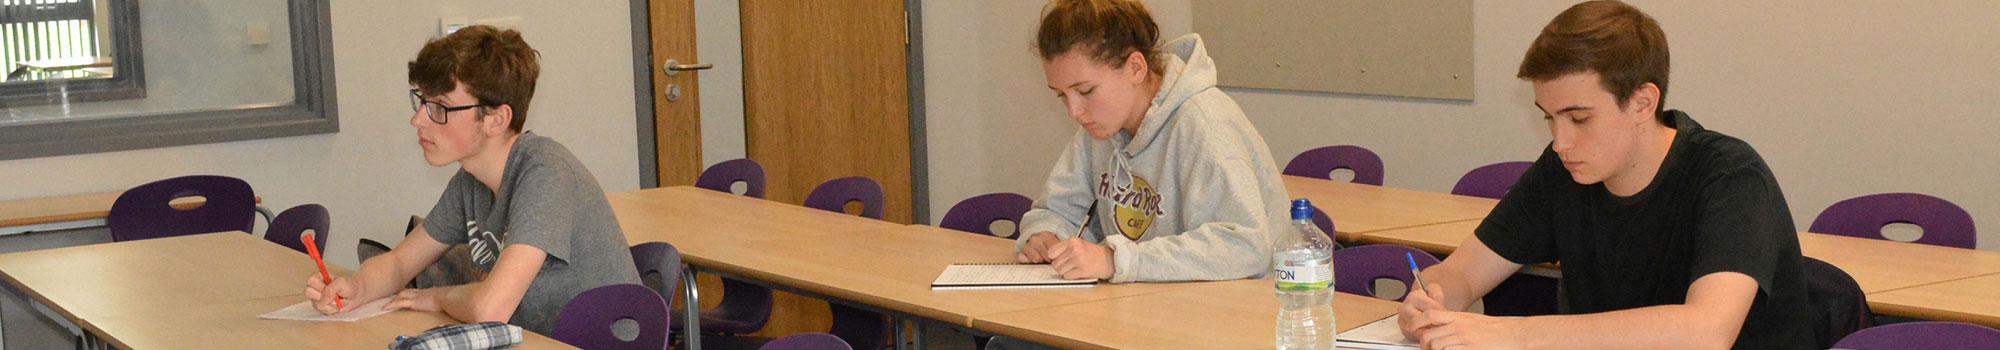 Pupils and facilities at Ysgol Morgan Llwyd Sixth Form in Wrexham